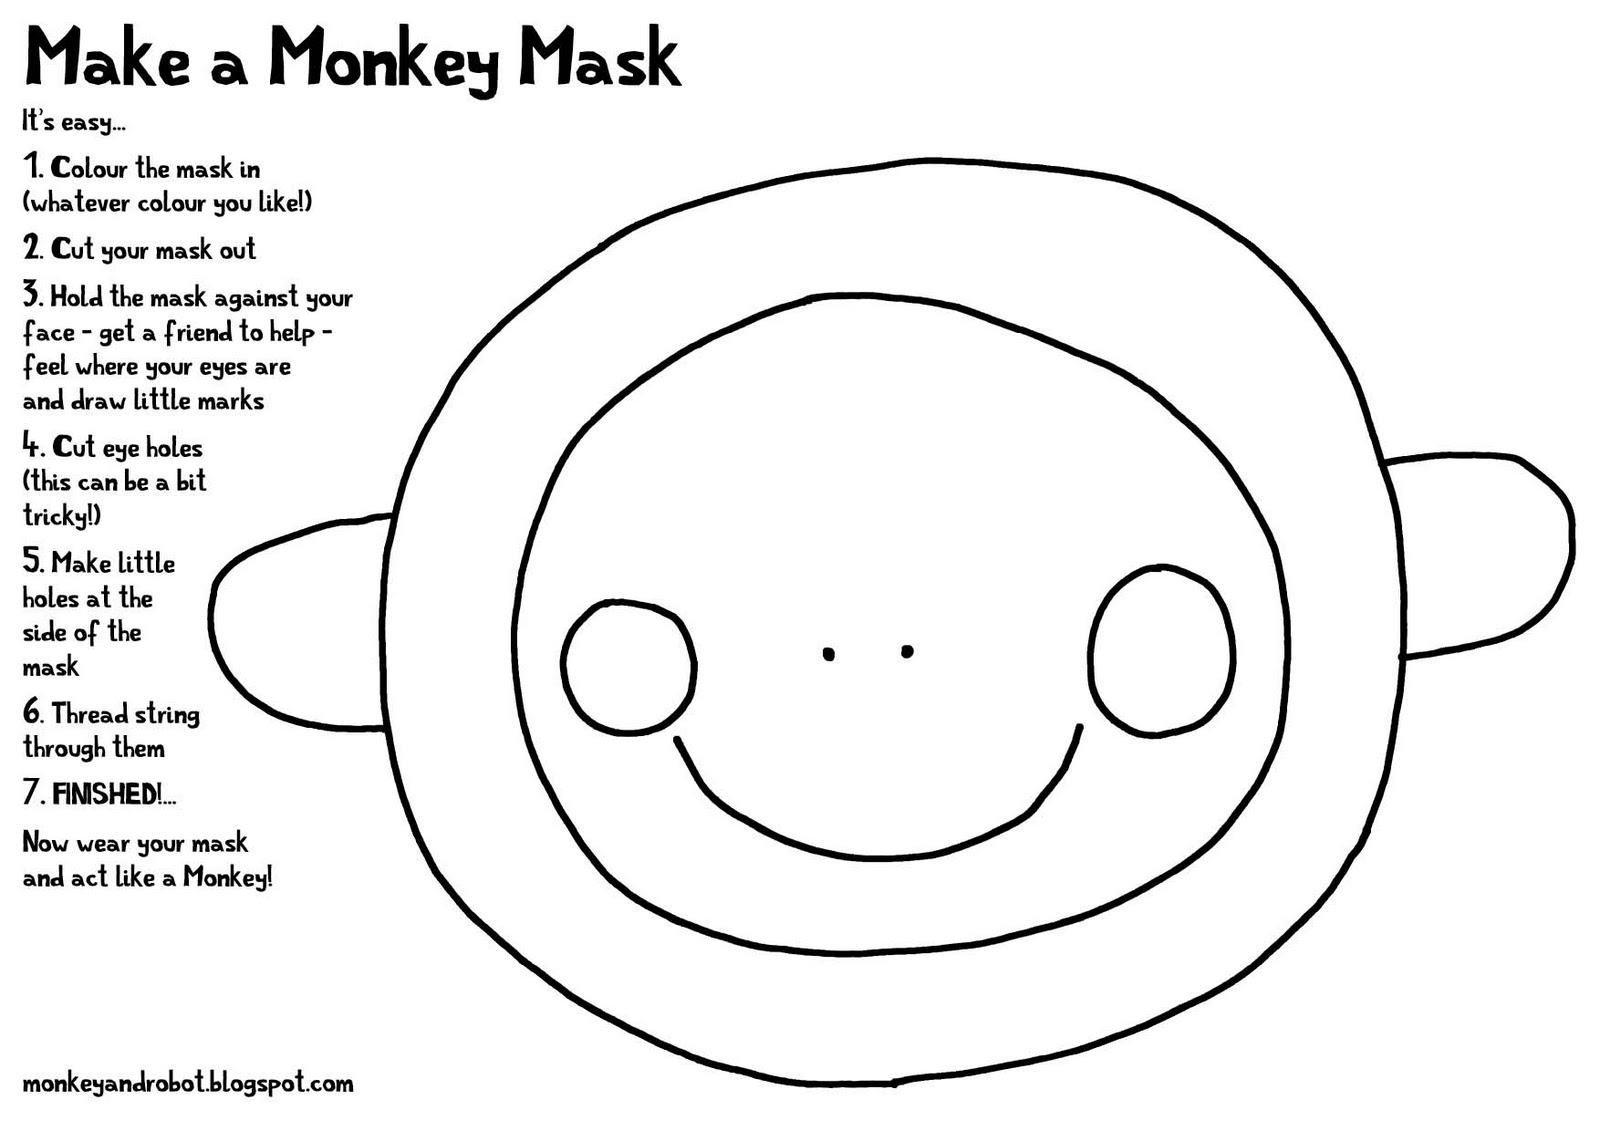 http://2.bp.blogspot.com/-lrP_NKIfXGc/TonDV7eR6NI/AAAAAAAAAiQ/hKJHbjikh1o/s1600/make-a-monkey-mask.jpg